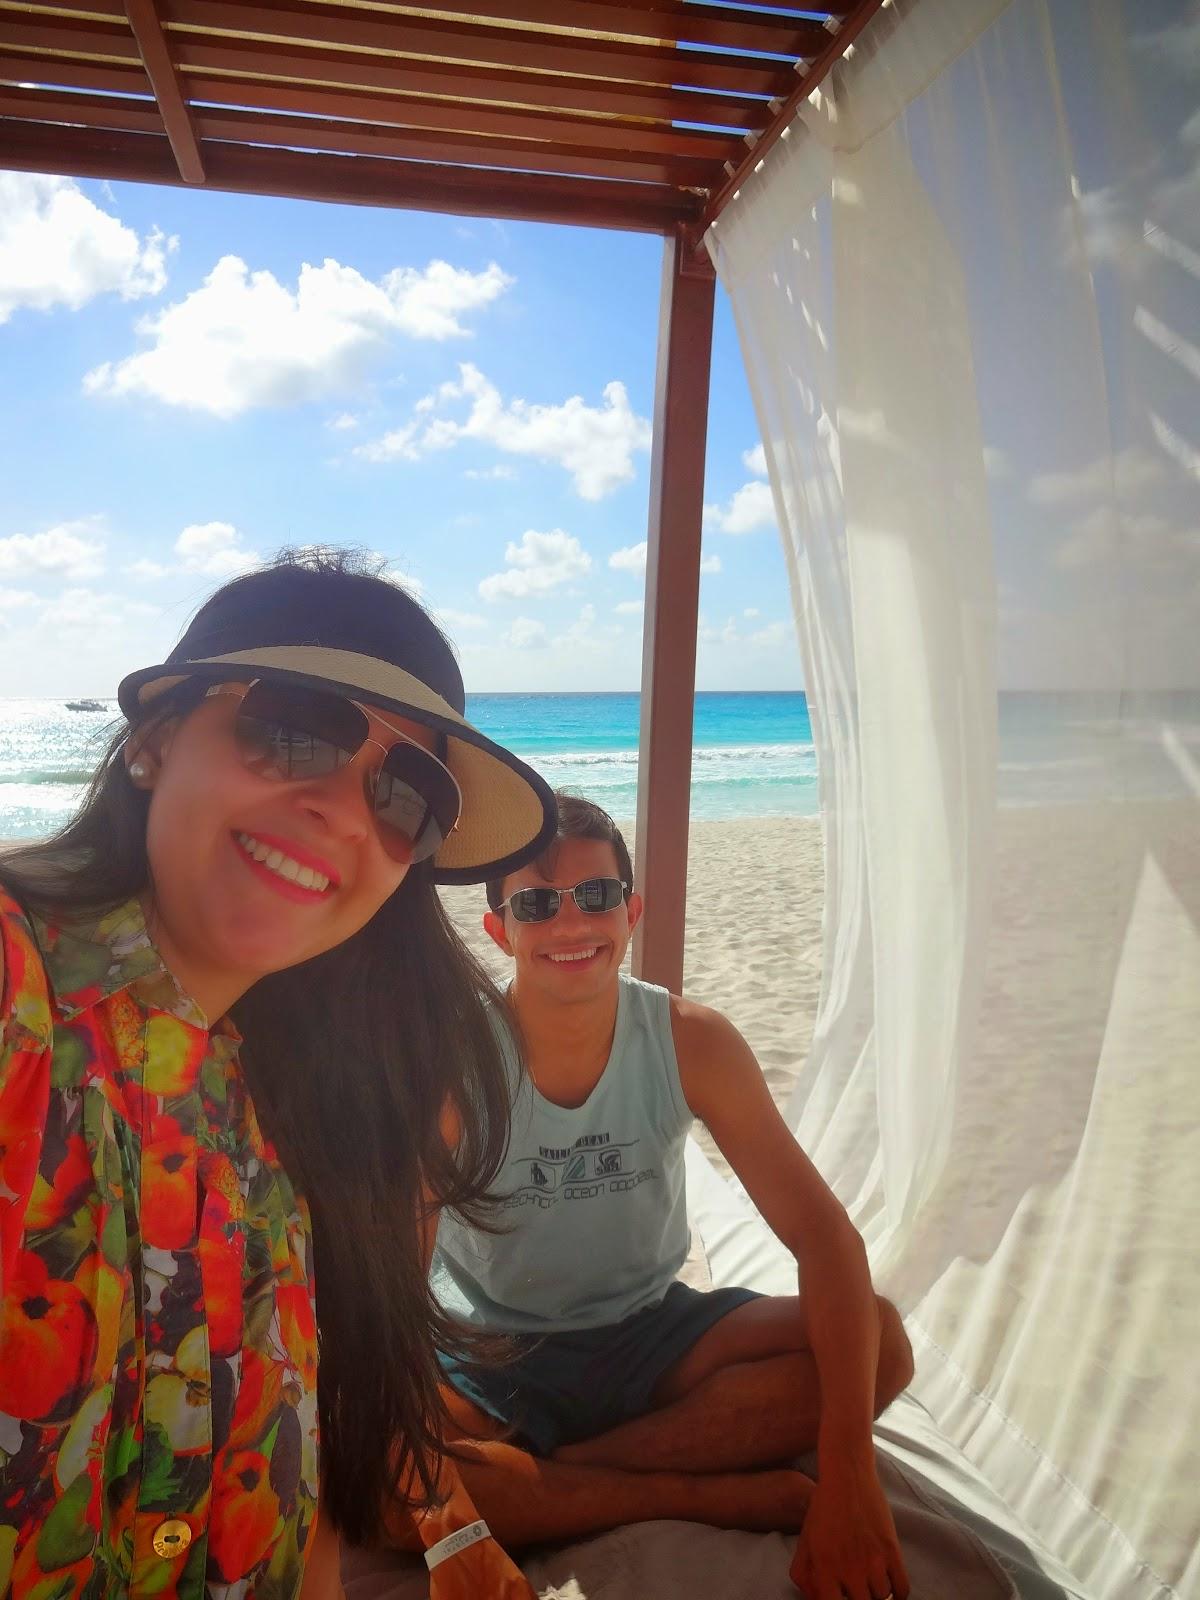 praia privativa do resort - krystal cancun